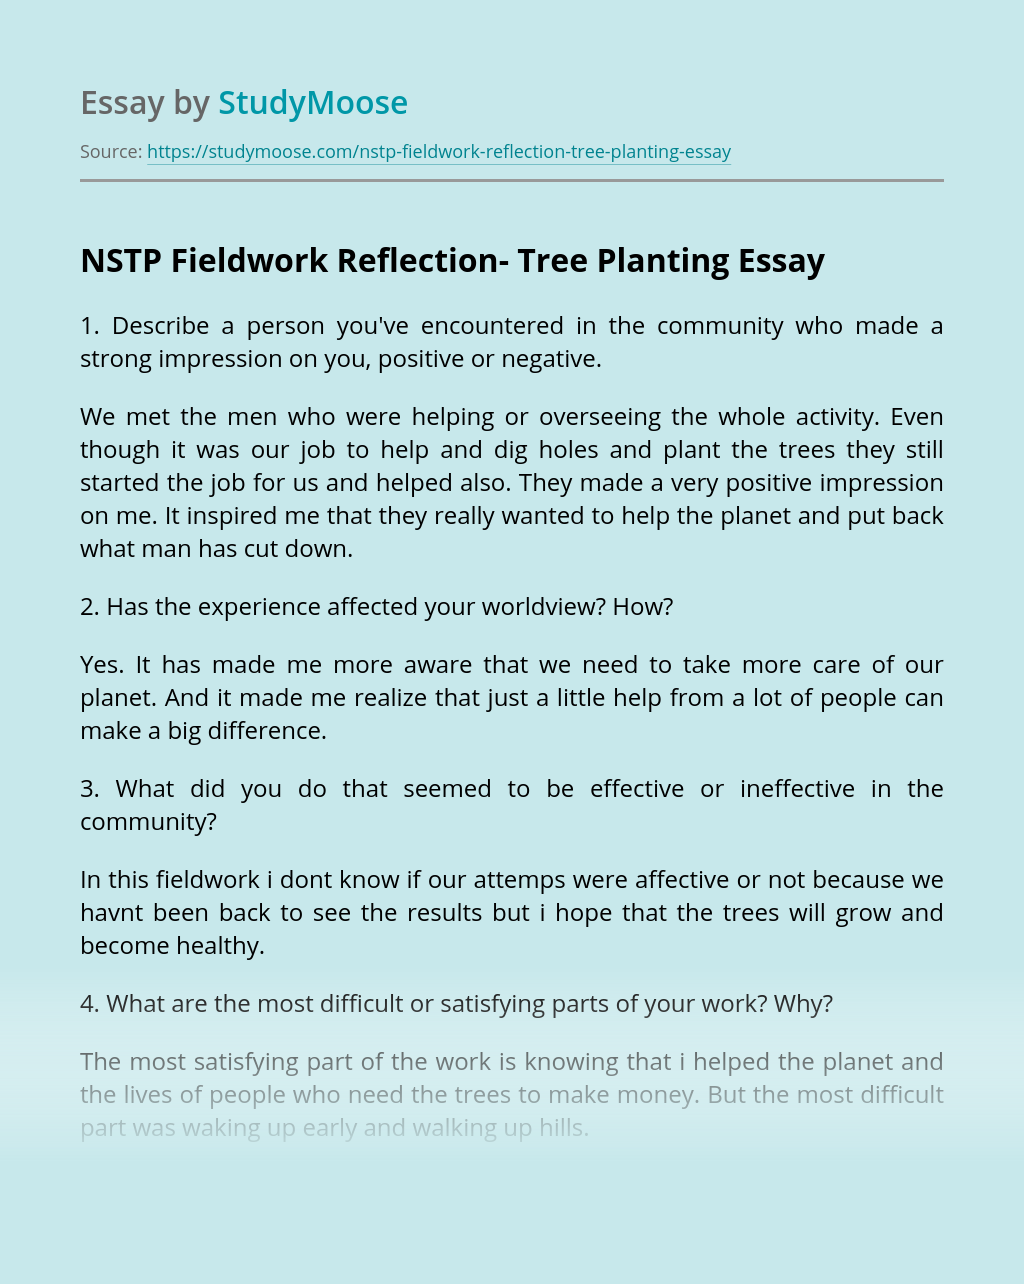 NSTP Fieldwork Reflection- Tree Planting